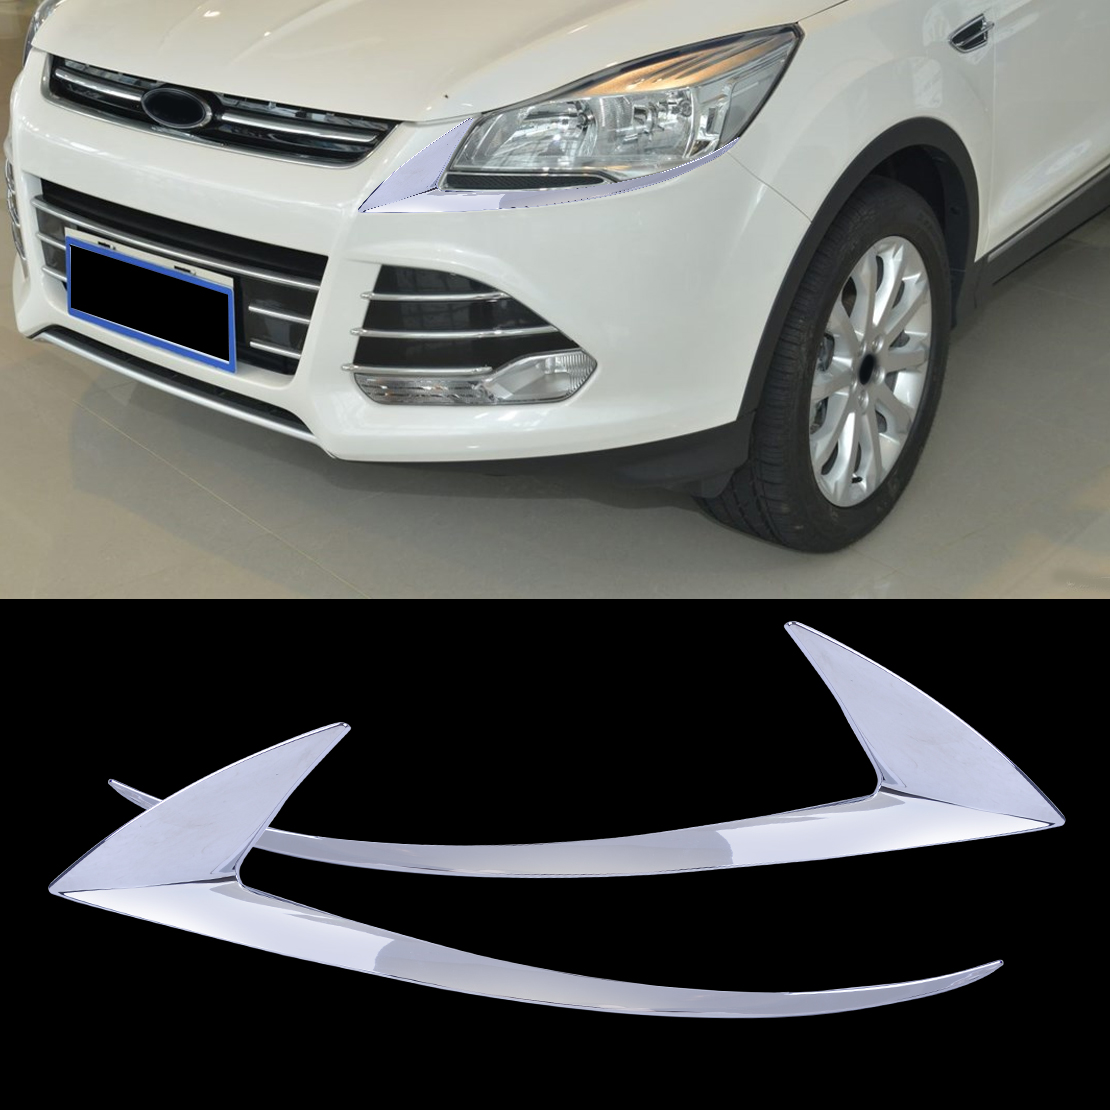 NEW 1 PC Front Bumper-Trim Molding Decorative plates For Ford Escape 2013-2016